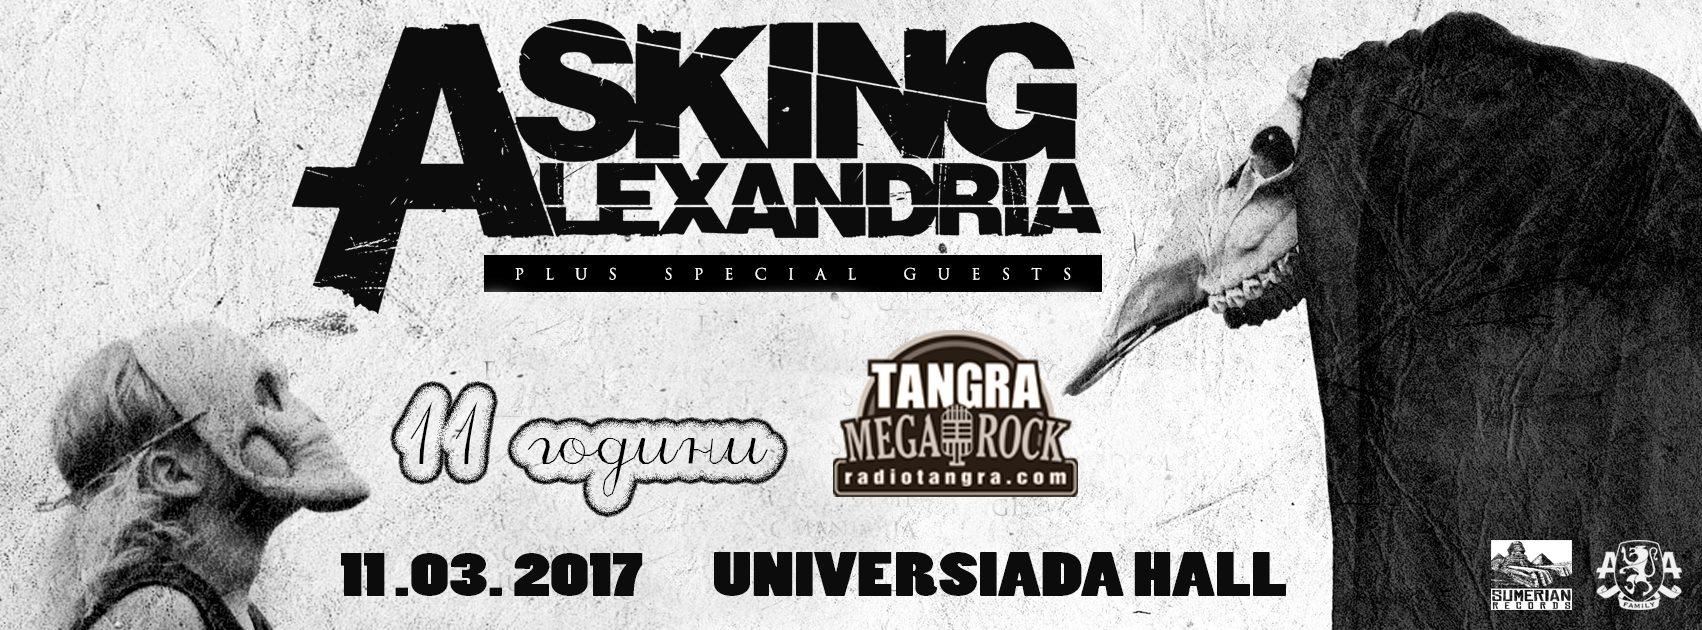 Asking Alexandria @ Universiada Hall (TMR11BD)